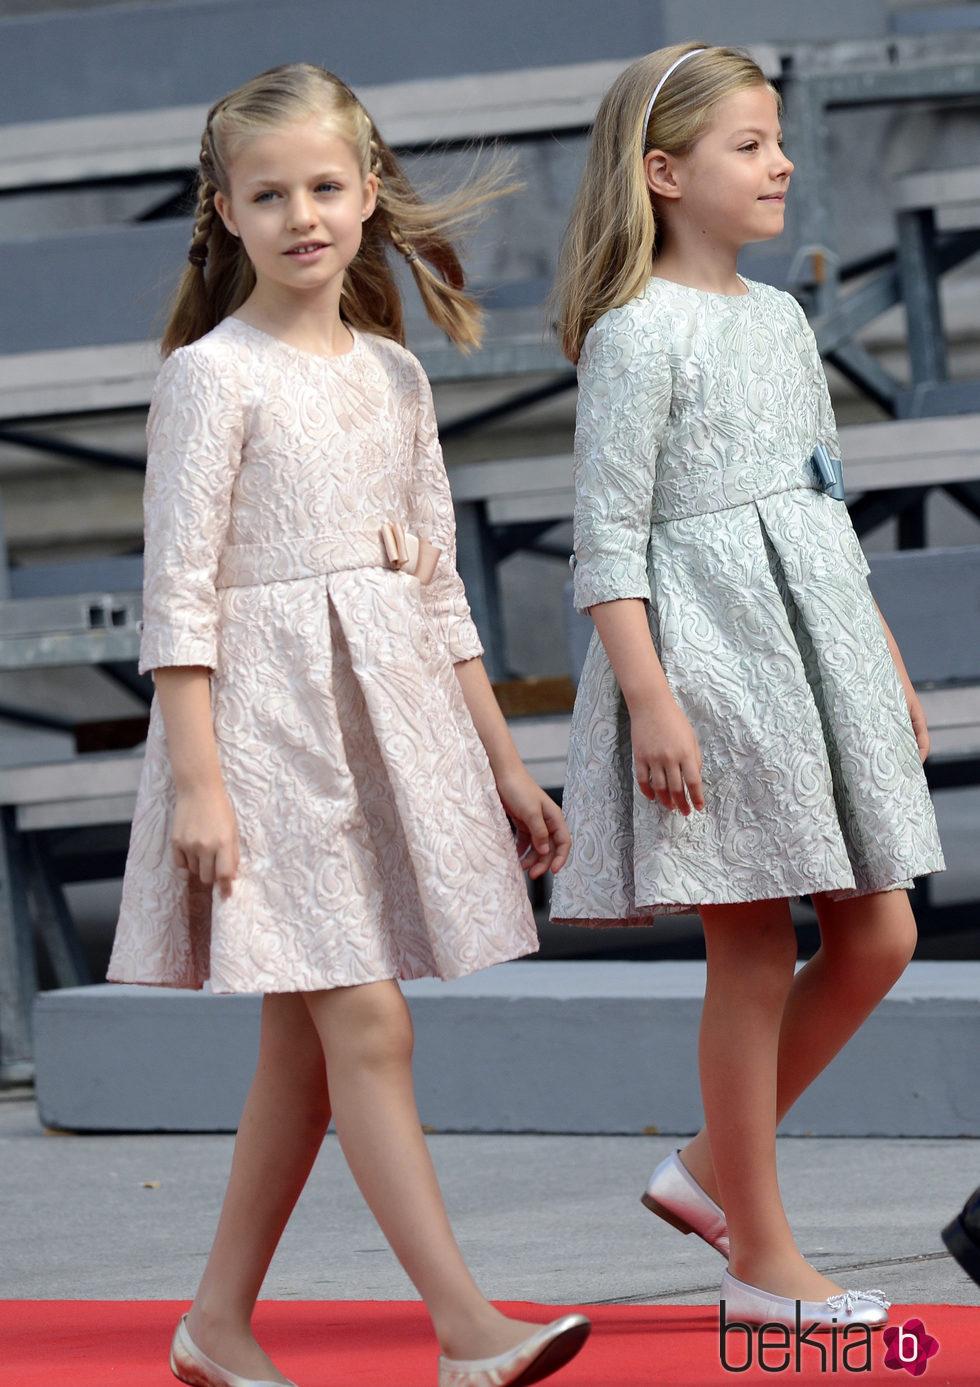 La princesa Leonor con vestido rosa claro